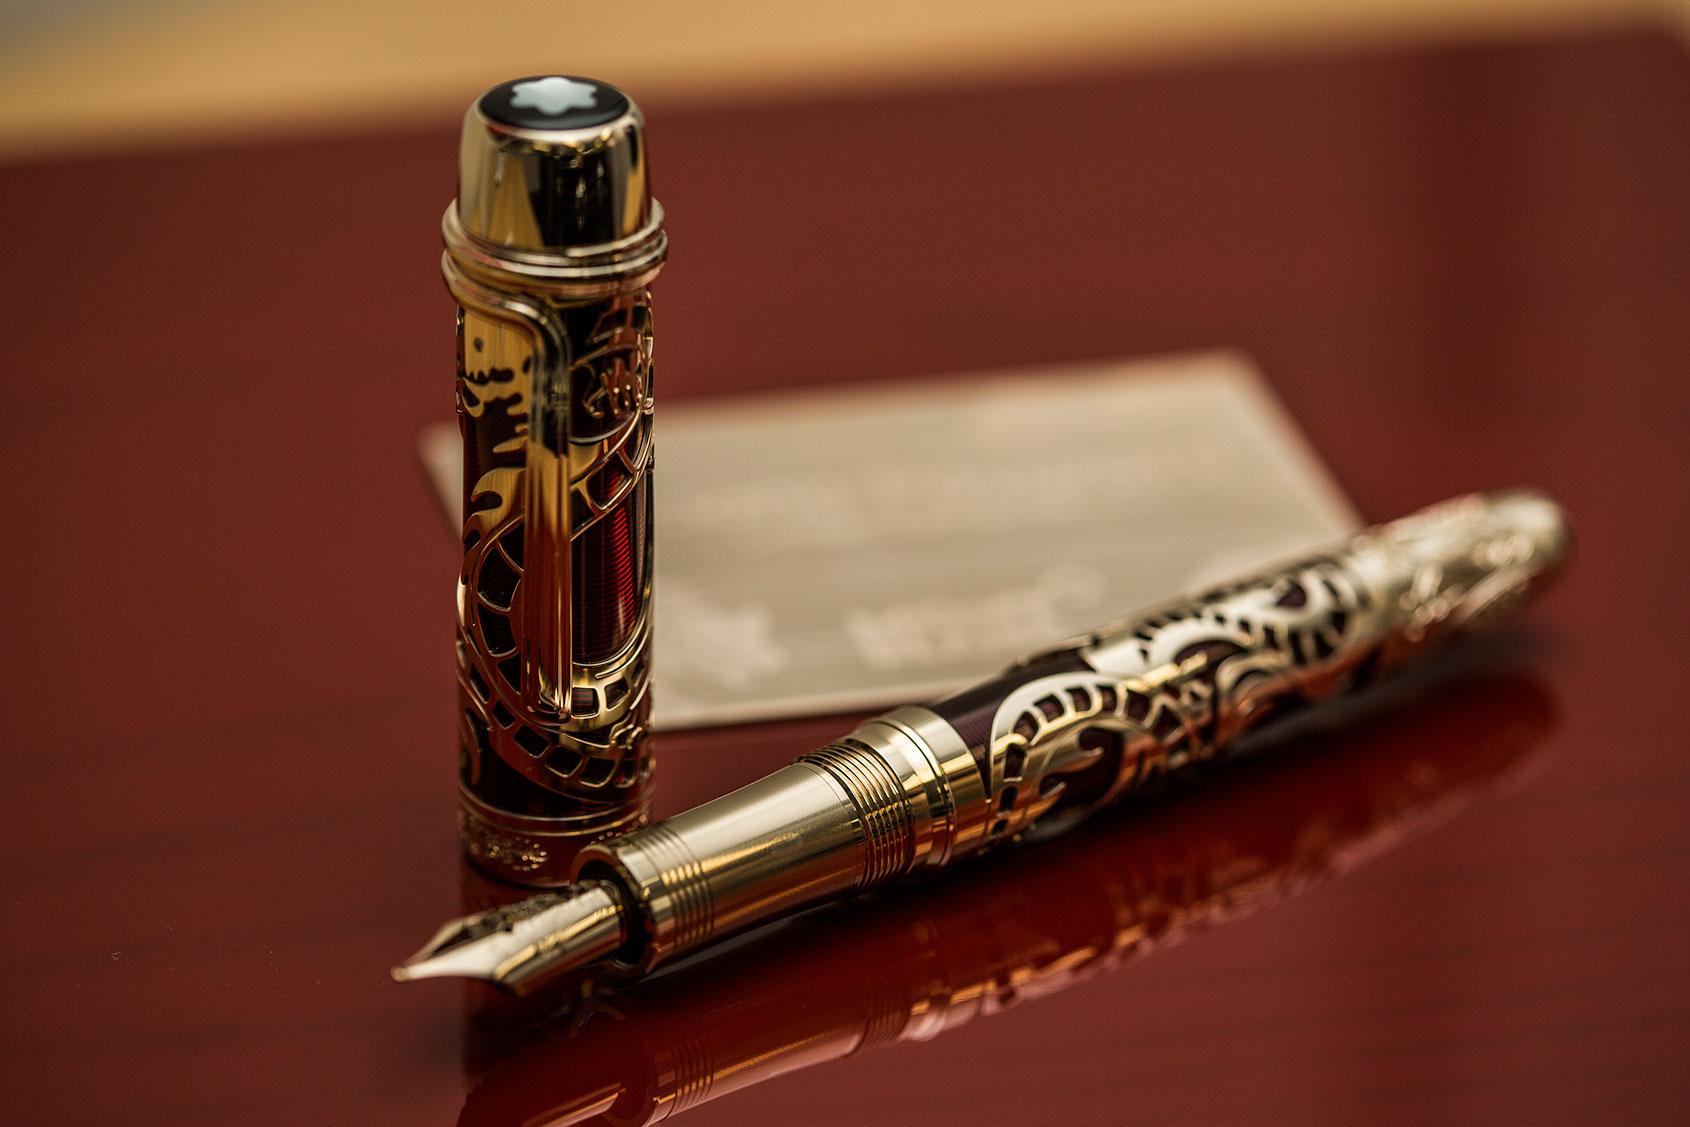 montblanc-writing-instrument-8